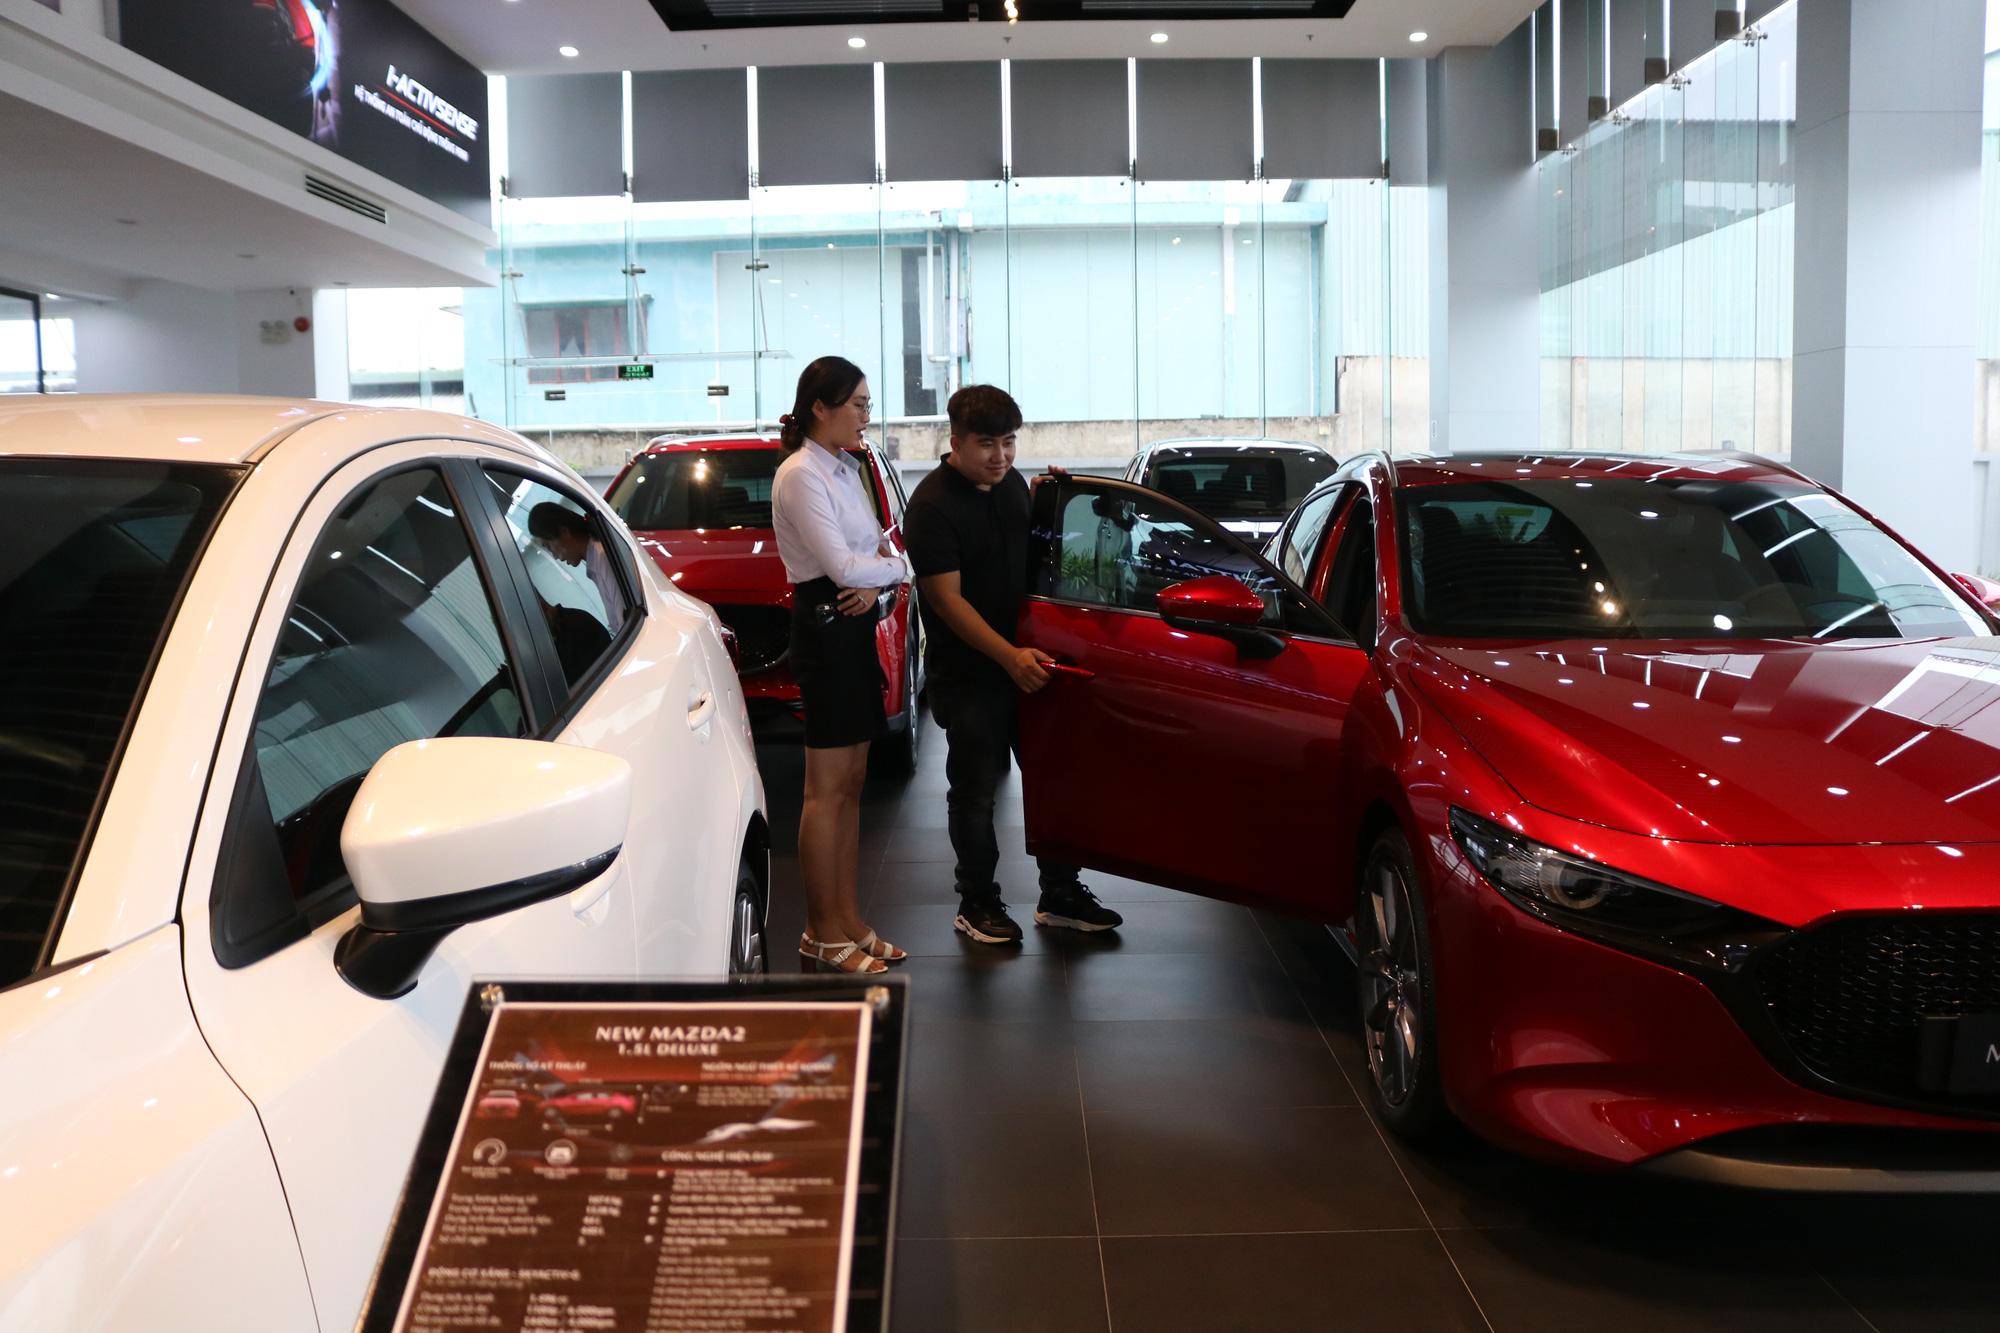 Vietnam's THACO recalls over 61,000 Mazda cars over faulty fuel pumps